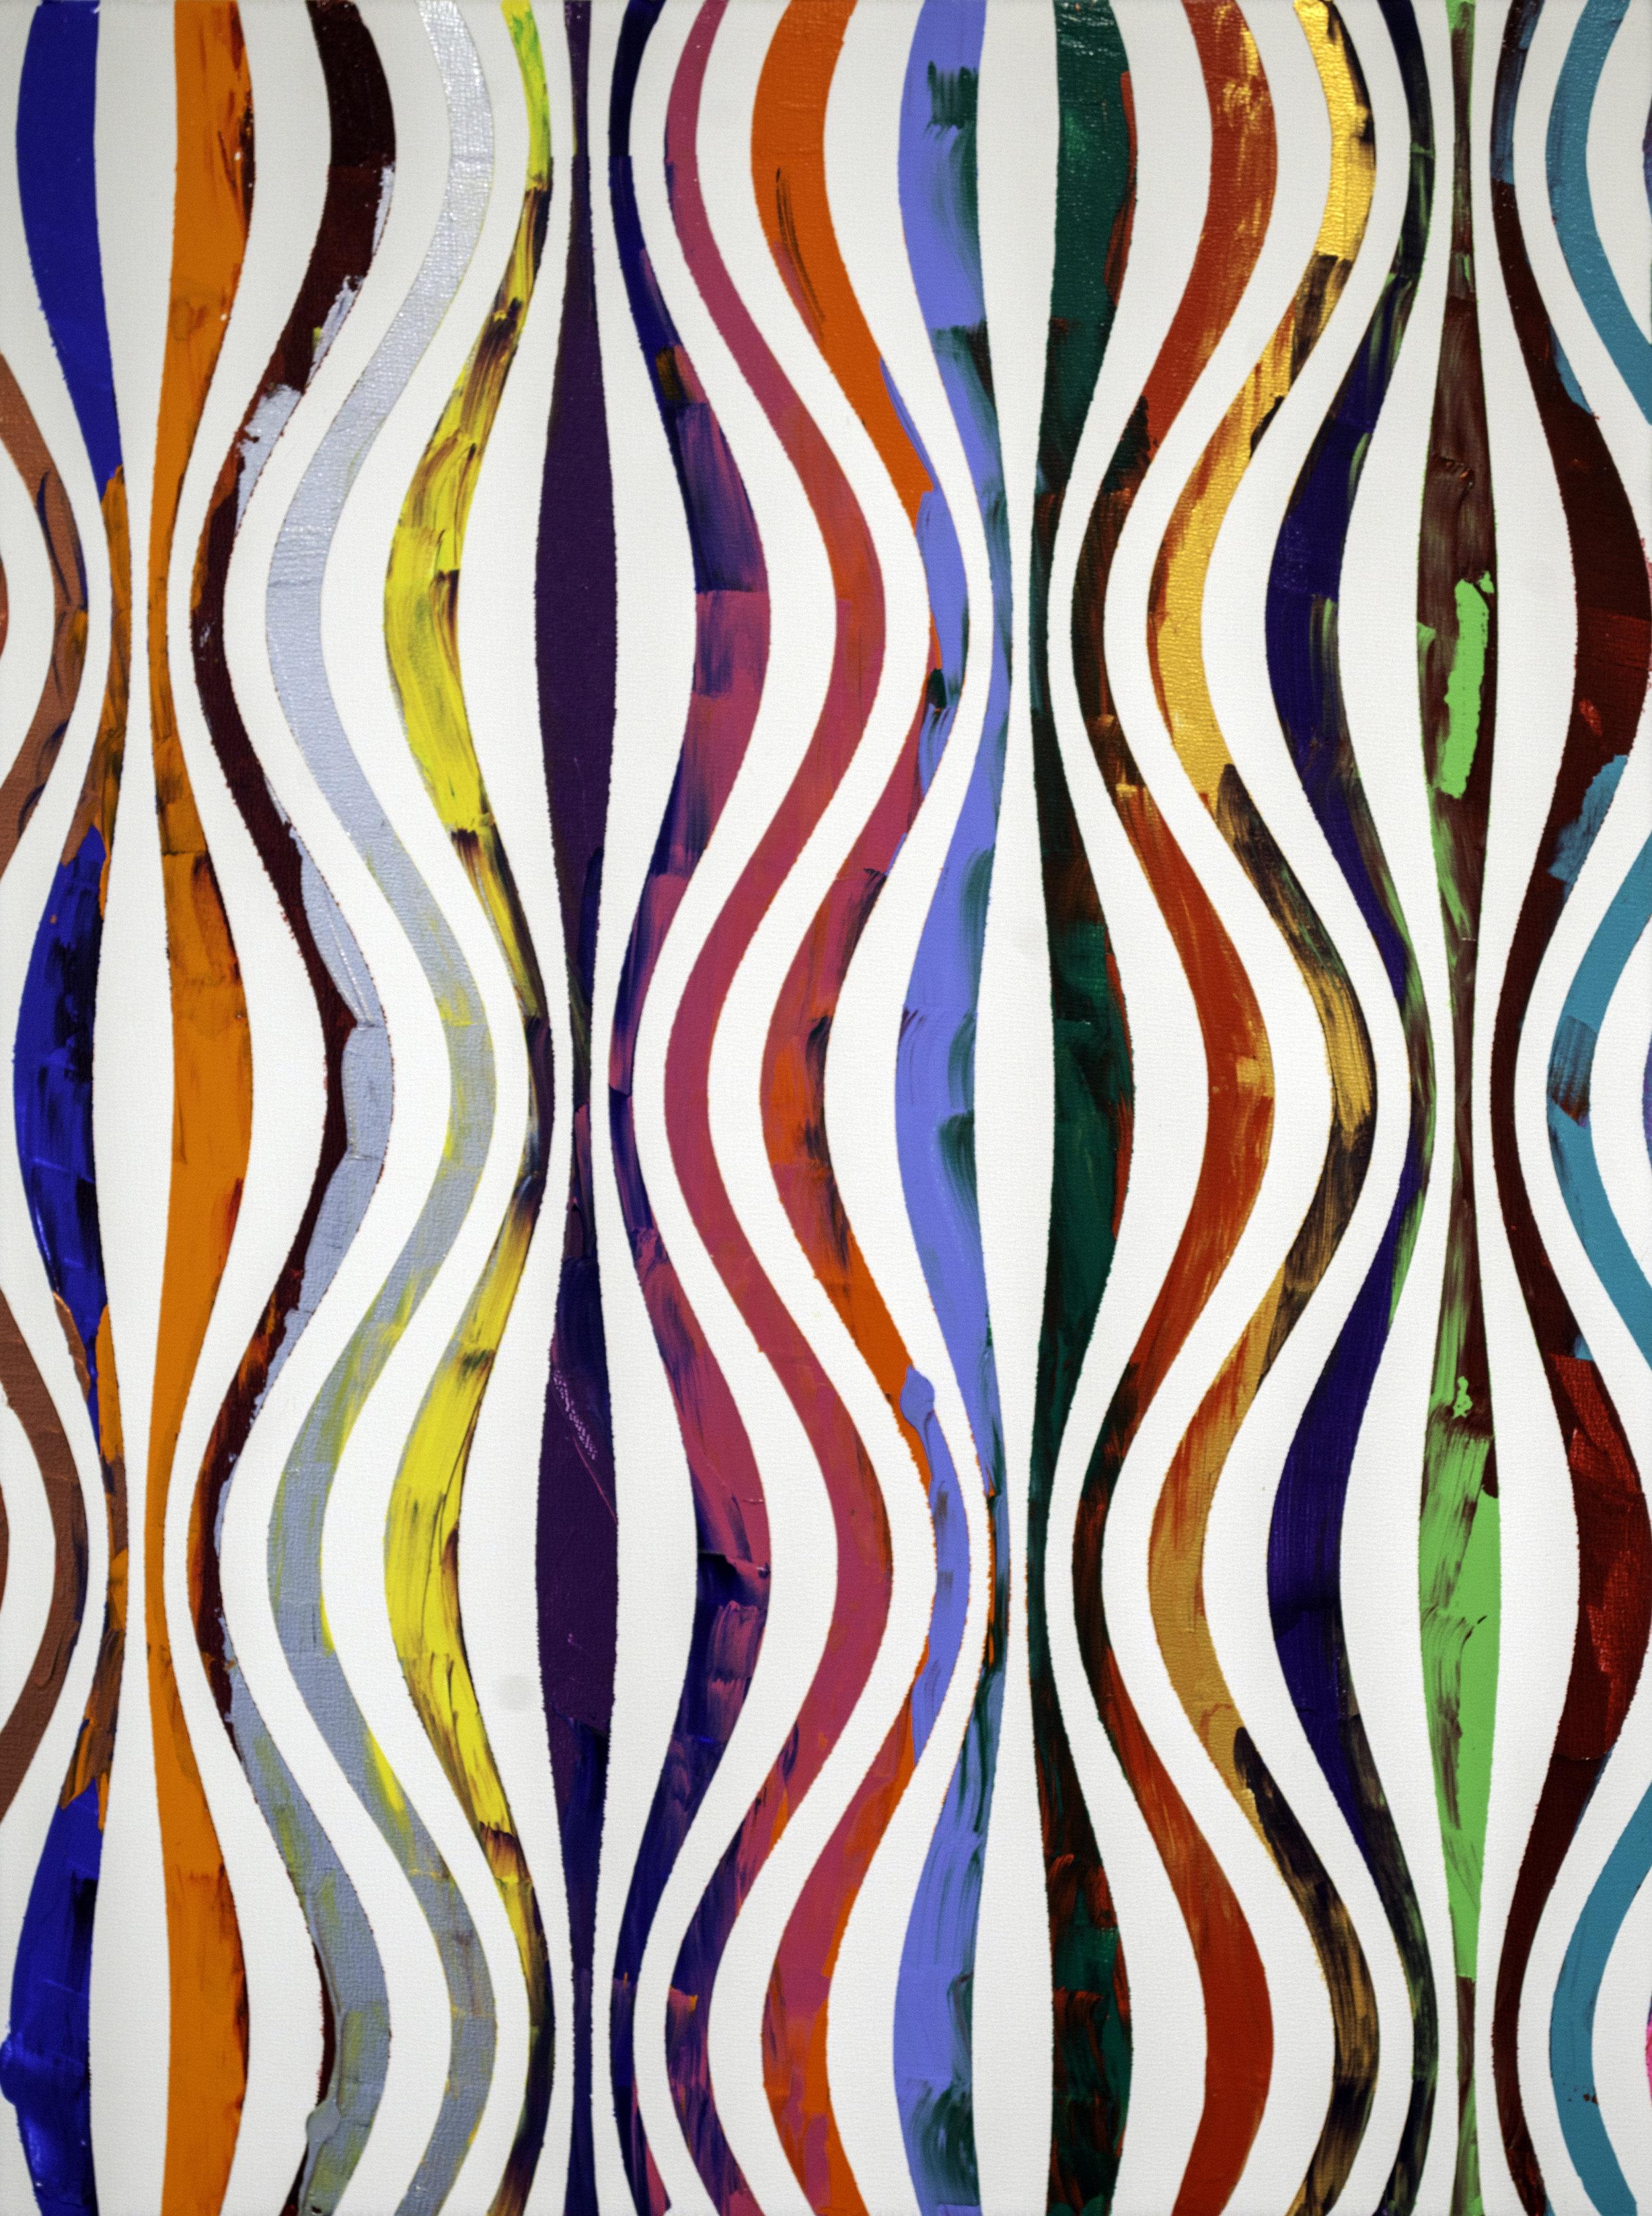 "HUE Gallery of Contemporary Art - Sean Christopher Ward - Spectrum Waves - Acrylic on MDF - 12""x16""x0.38"" - 2019 - $375.jpg"